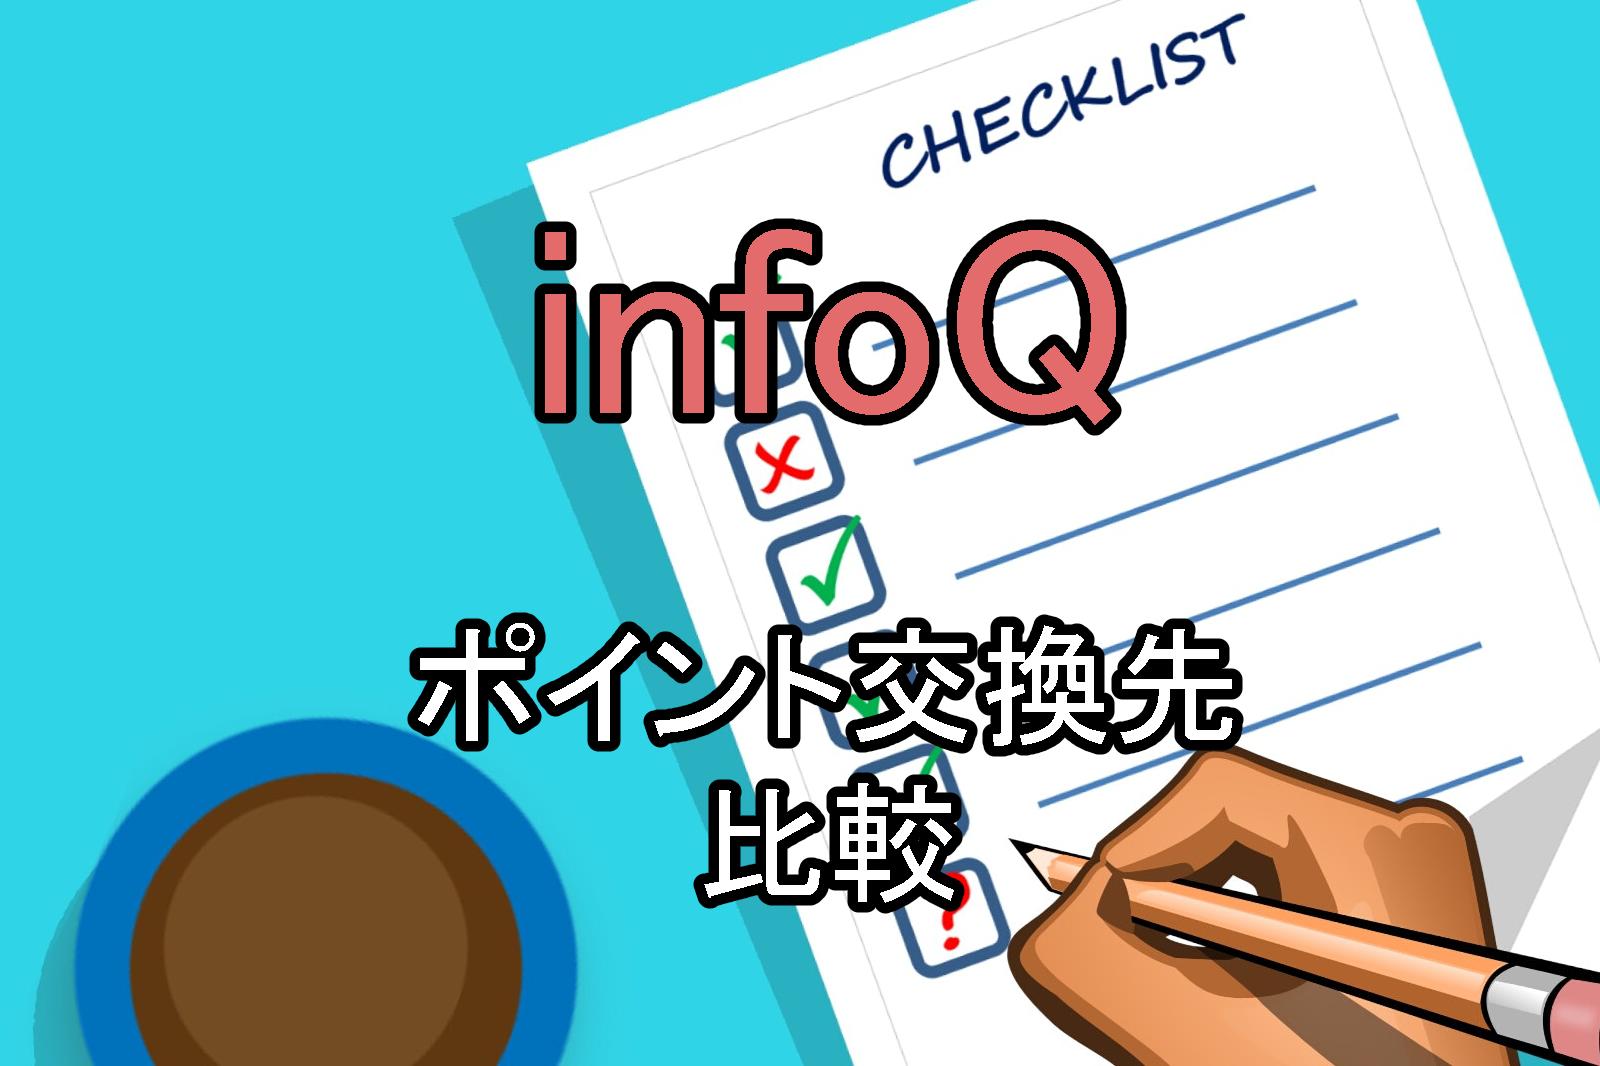 infoQ ポイント交換先 比較